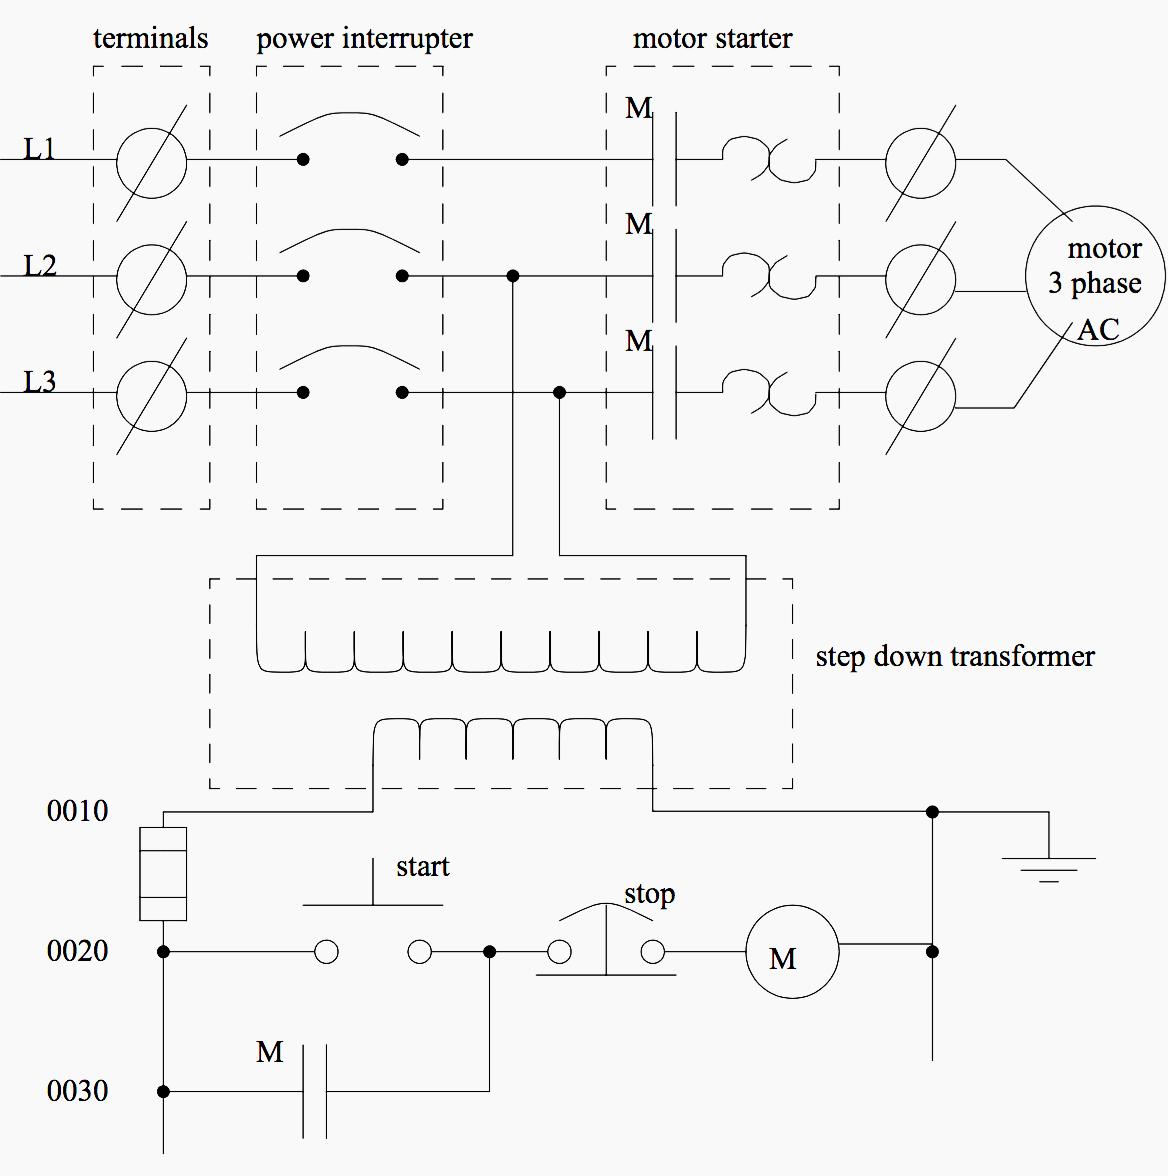 Single Line Wiring Diagram Plc | Manual E-Books - Plc Wiring Diagram